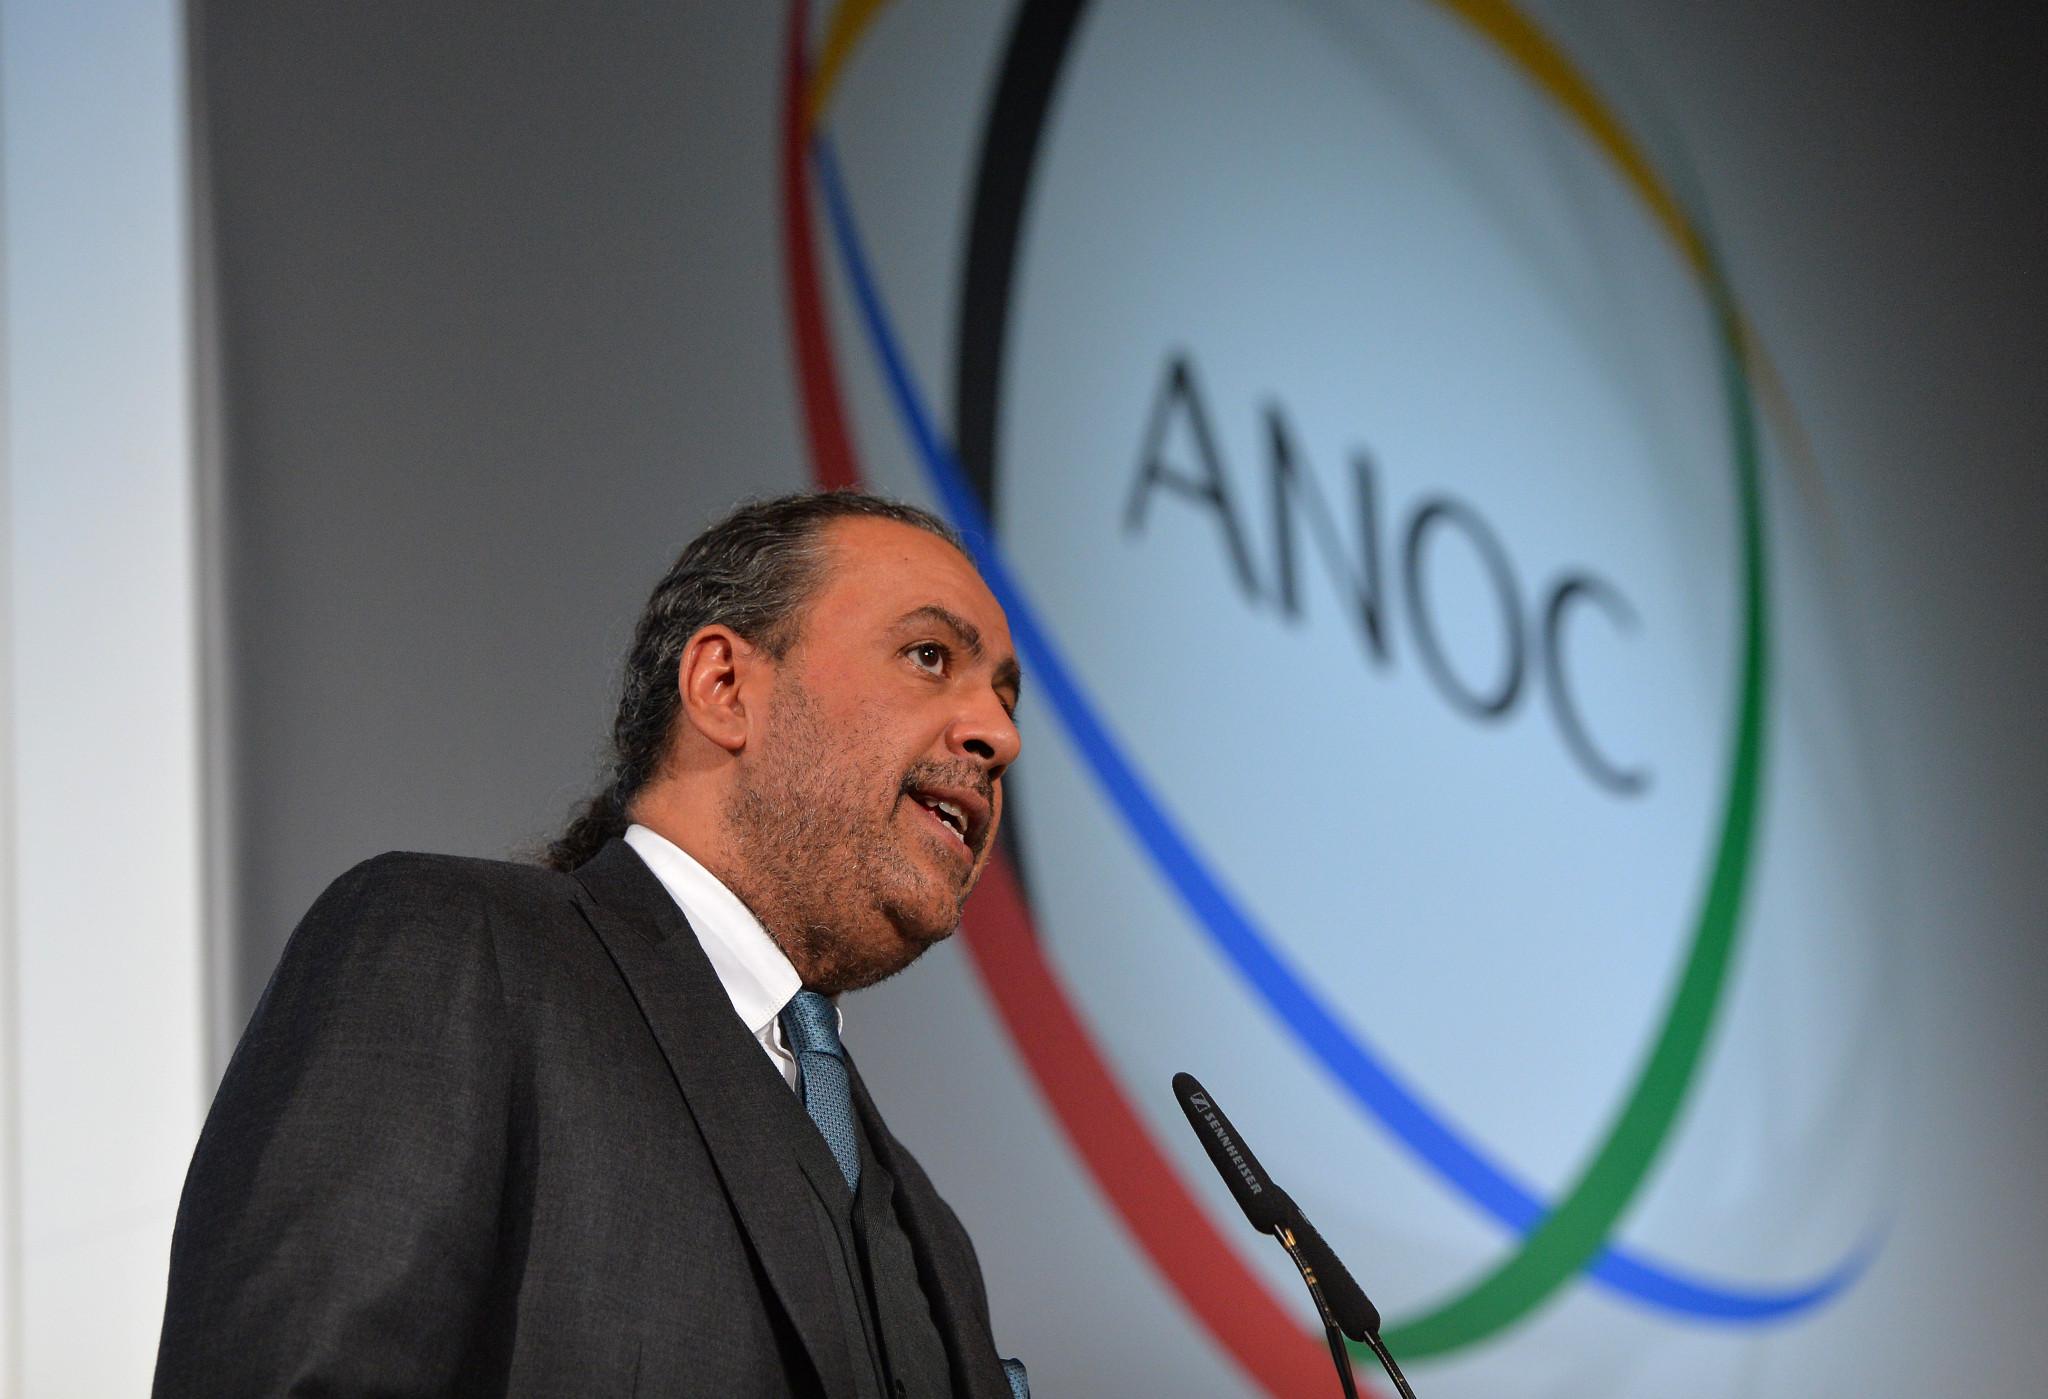 Sheikh Ahmad Al-Fahad Al-Sabah has praised both the organisers of, and the athletes at, Pyeongchang 2018 ©Getty Images